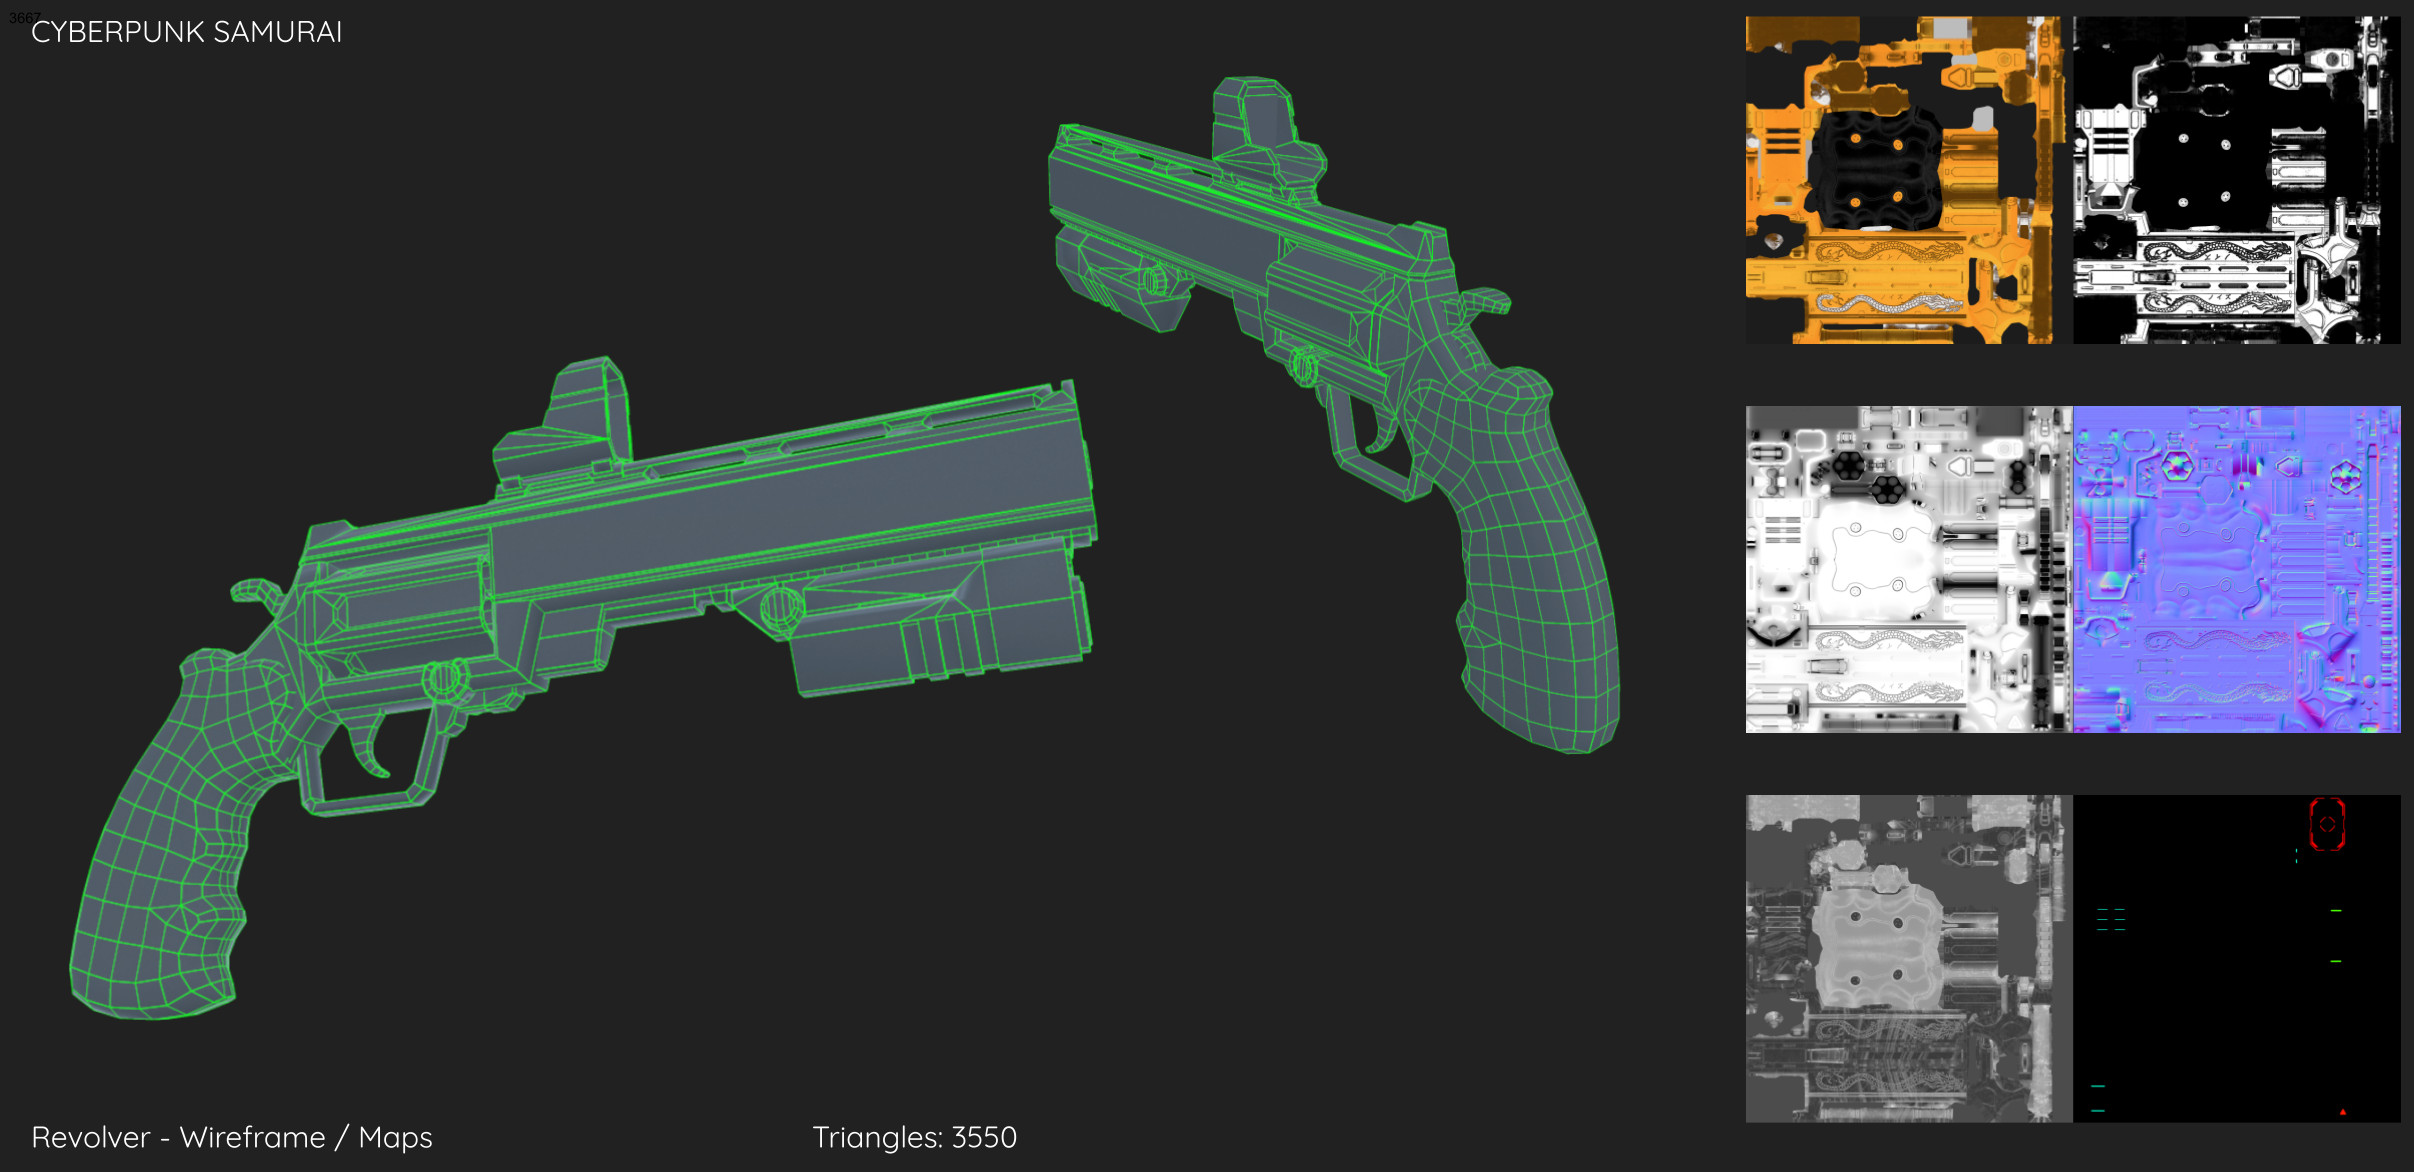 Cyberpunk Samurai - Revolver Wireframe/Maps